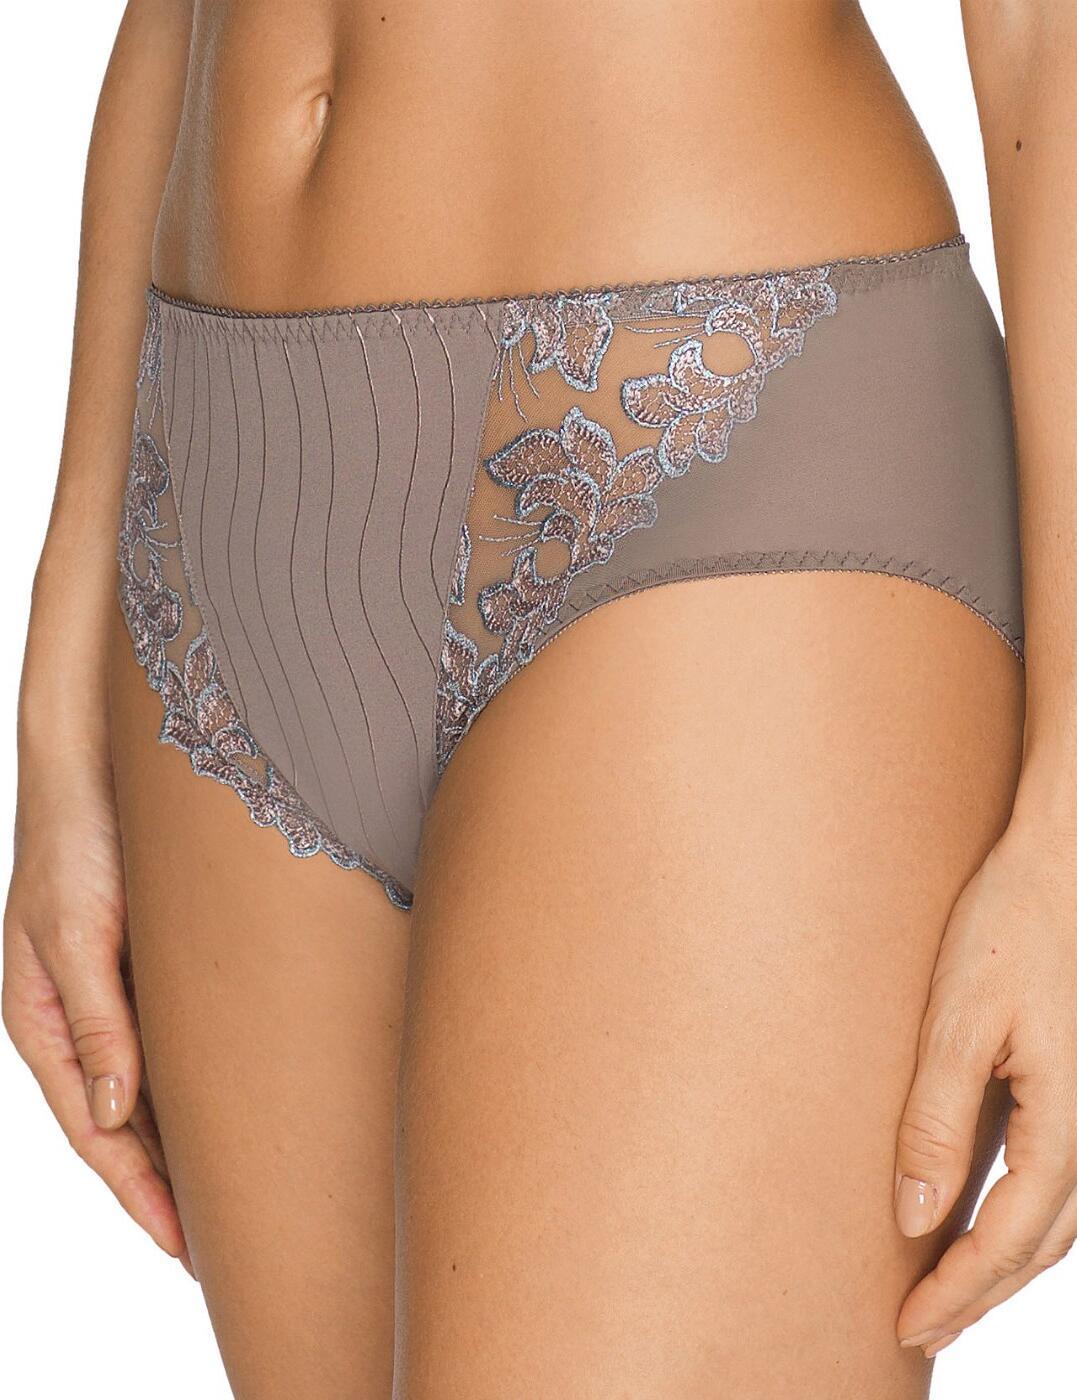 Prima-Donna-Deauville-Volle-Unterhose-Slip-Slips-Pant-0561811-Luxus-Dessous Indexbild 29